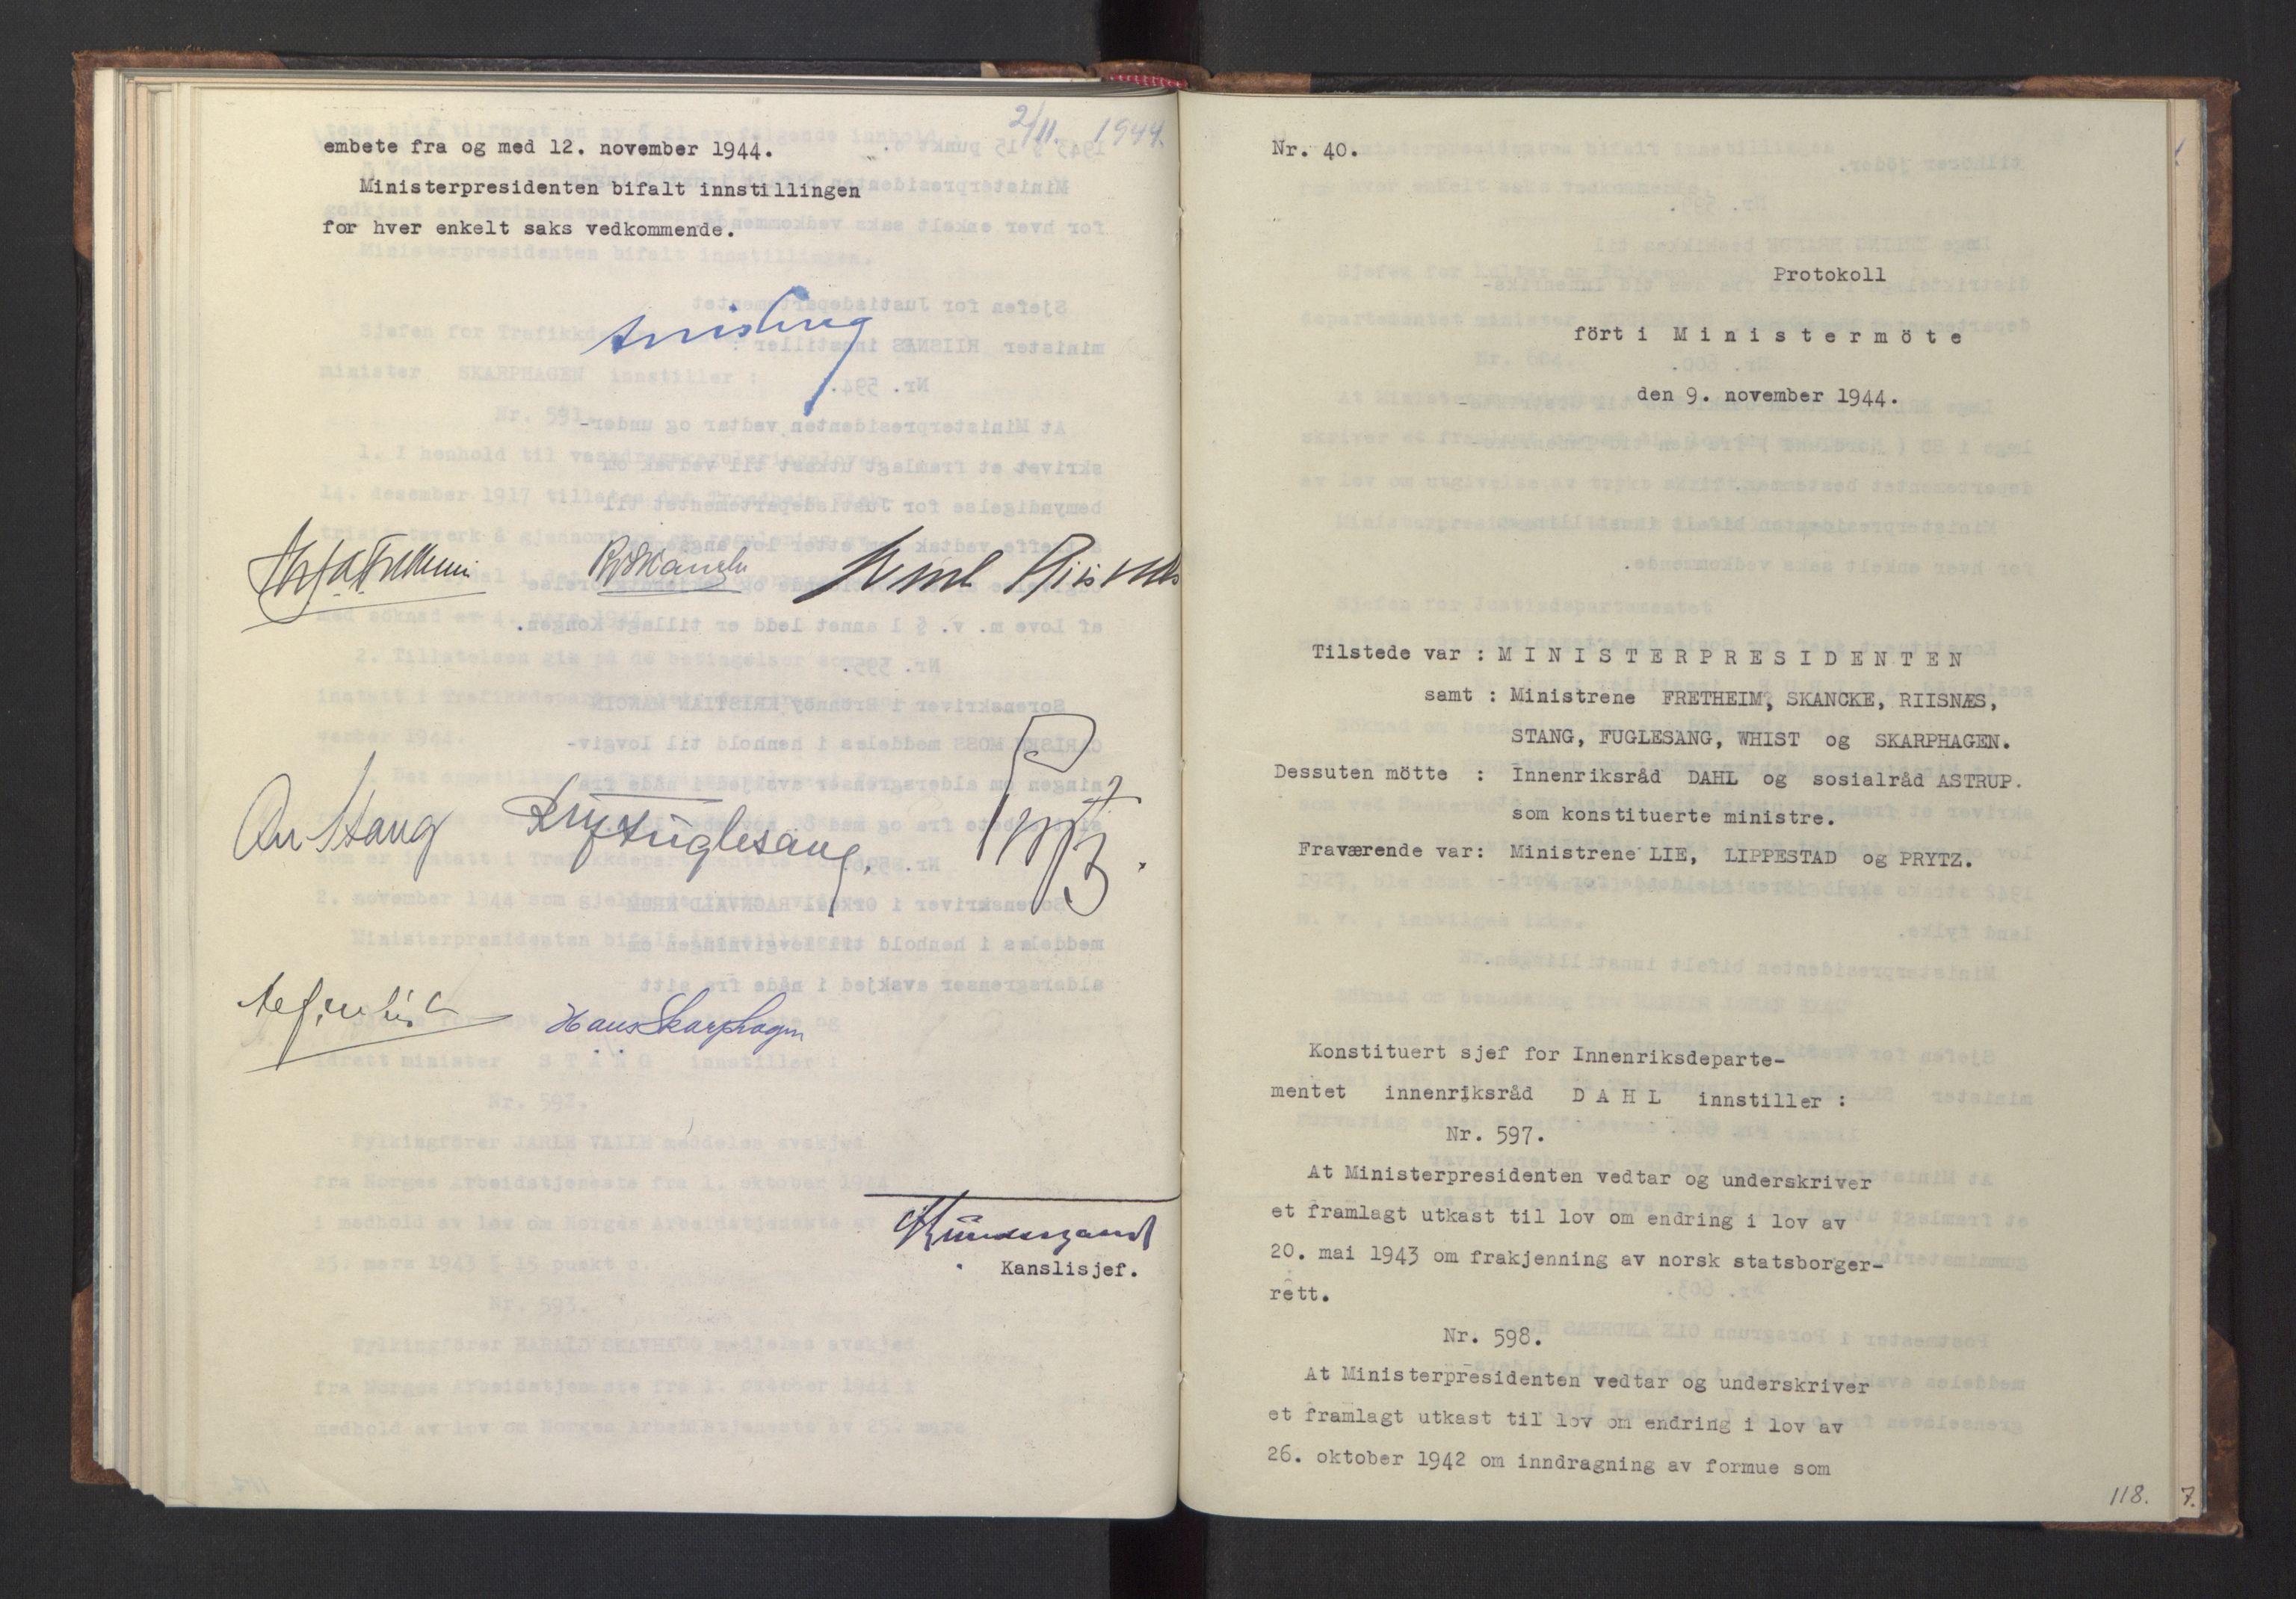 RA, NS-administrasjonen 1940-1945 (Statsrådsekretariatet, de kommisariske statsråder mm), D/Da/L0005: Protokoll fra ministermøter, 1944, s. 117b-118a